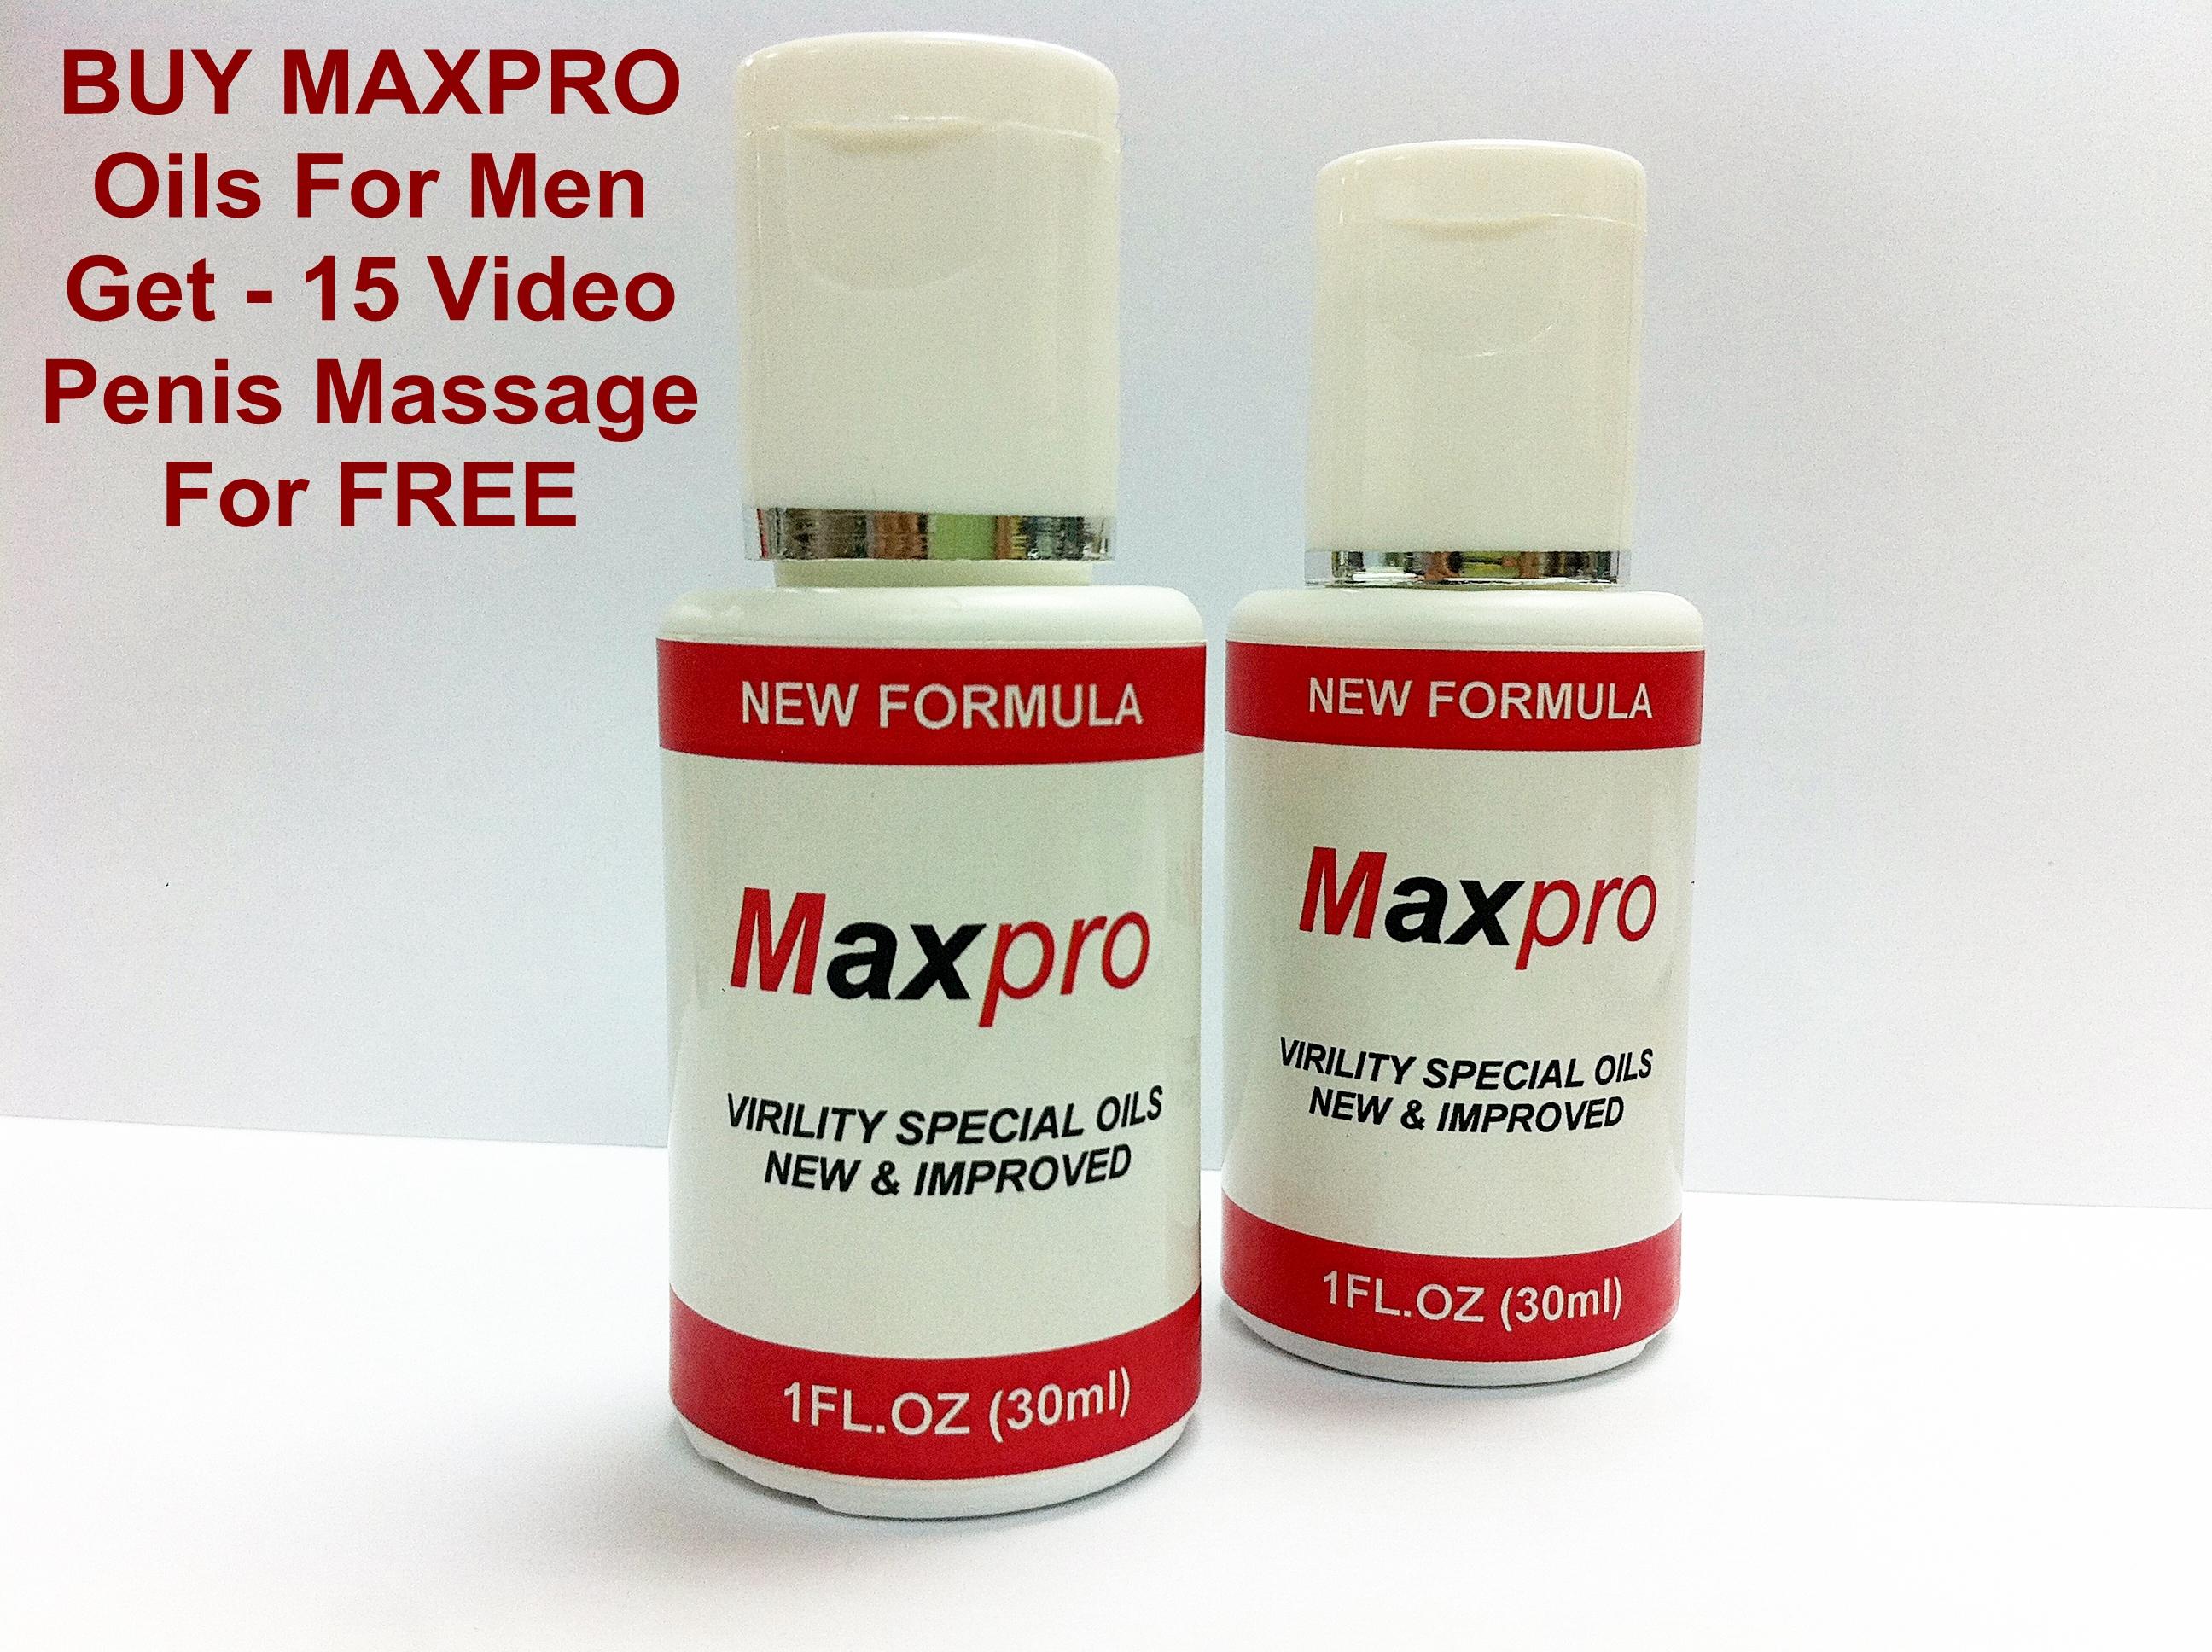 New Products Primahillscom Healthcare Herbs Pharmacy Vitahealth Prostate 30 Kapsul Maxpro Massage Oils Free Penis Technique